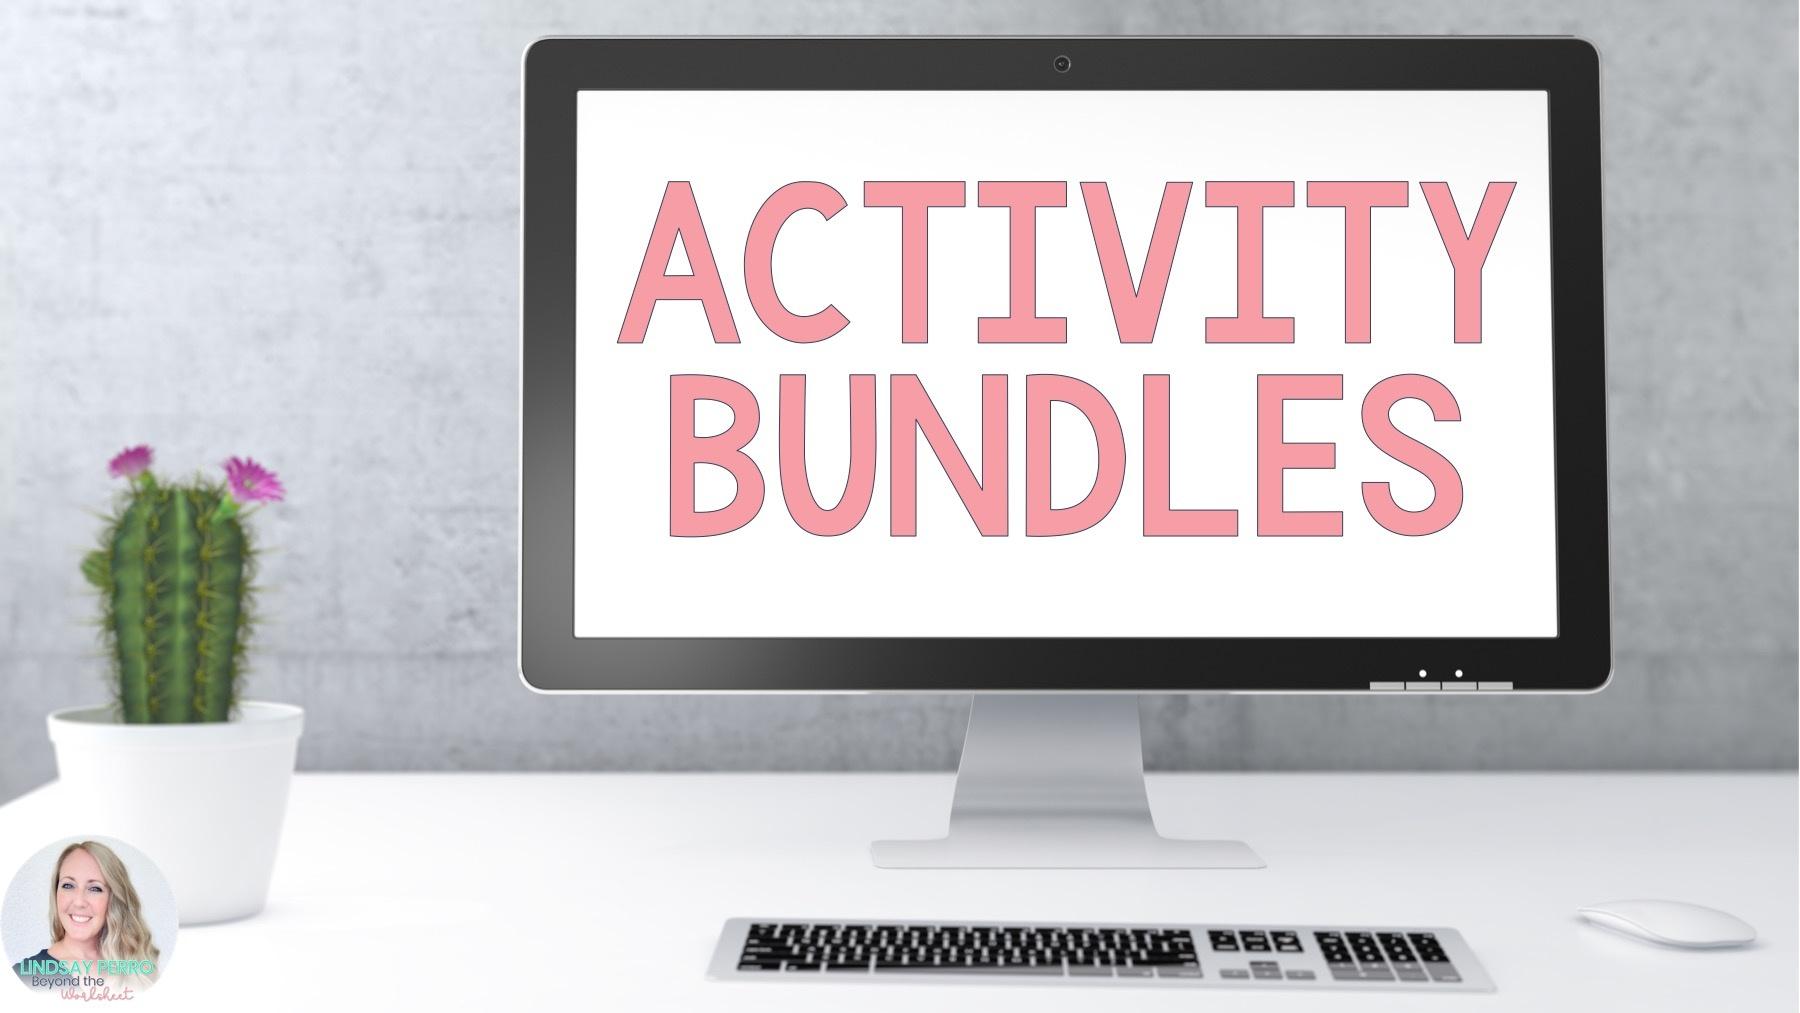 Activity Bundles